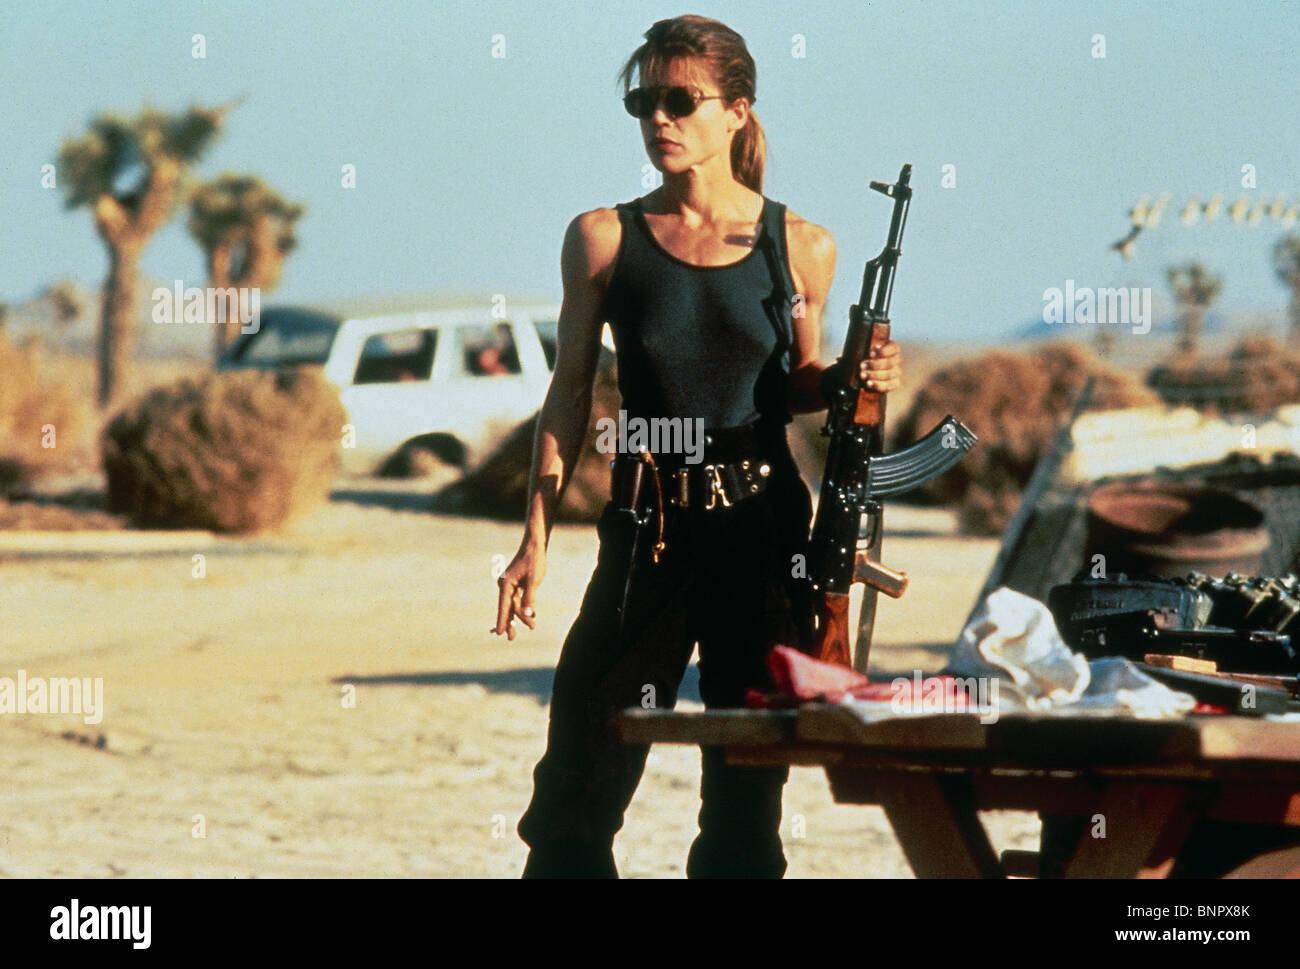 LINDA HAMILTON TERMINATOR 2: JUDGMENT DAY (1991) - Stock Image